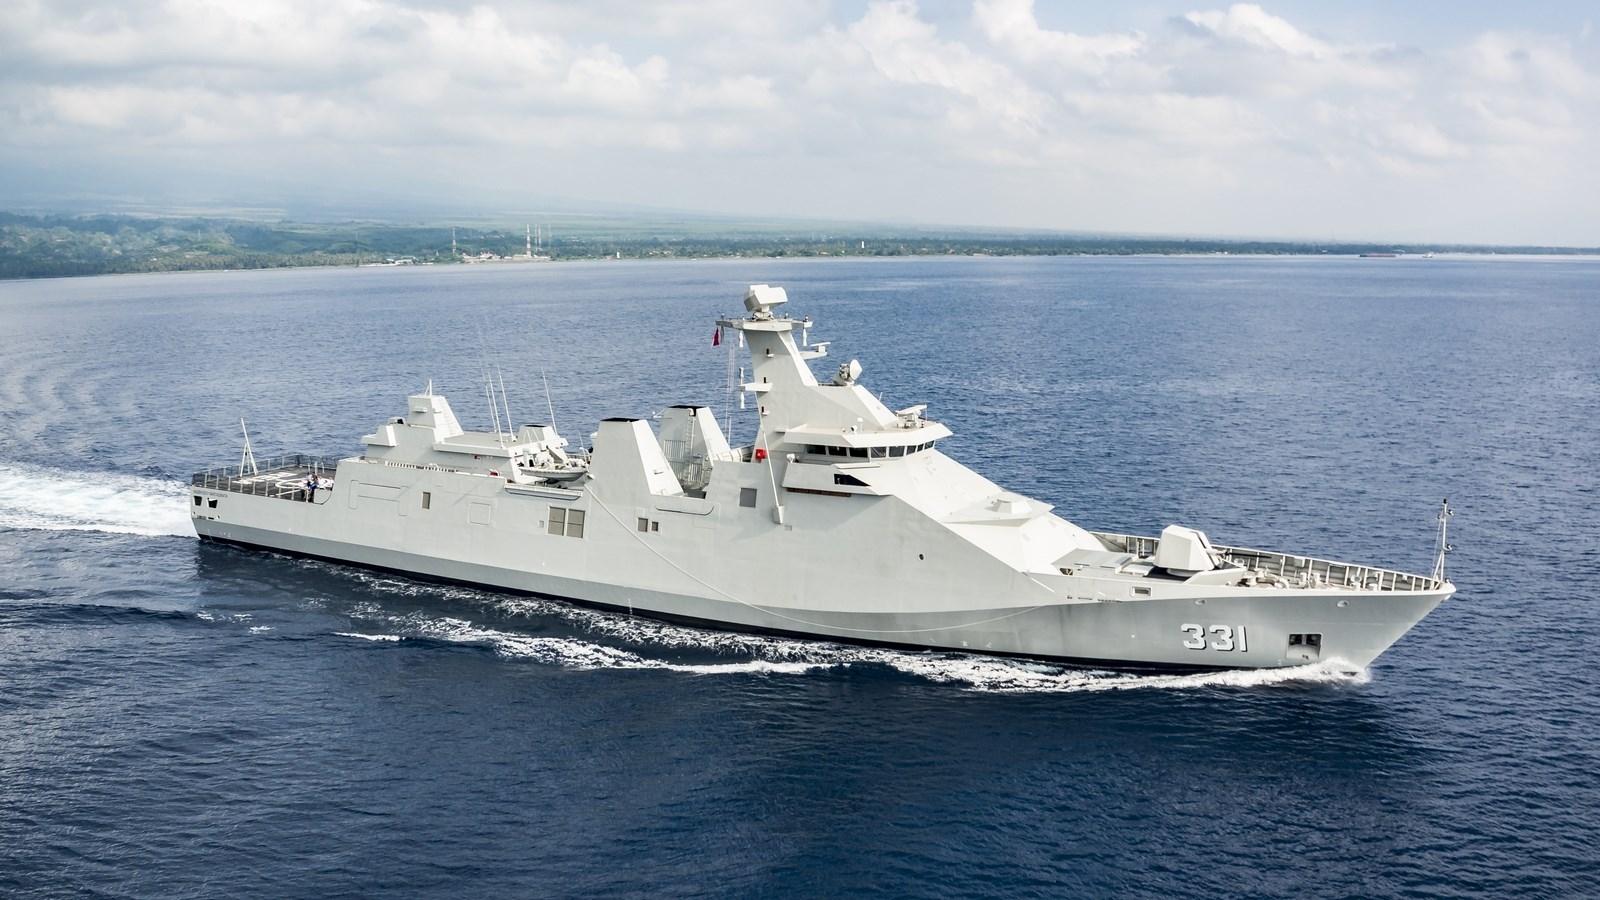 México busca comprar en EU misiles por 41 mdd para la Marina